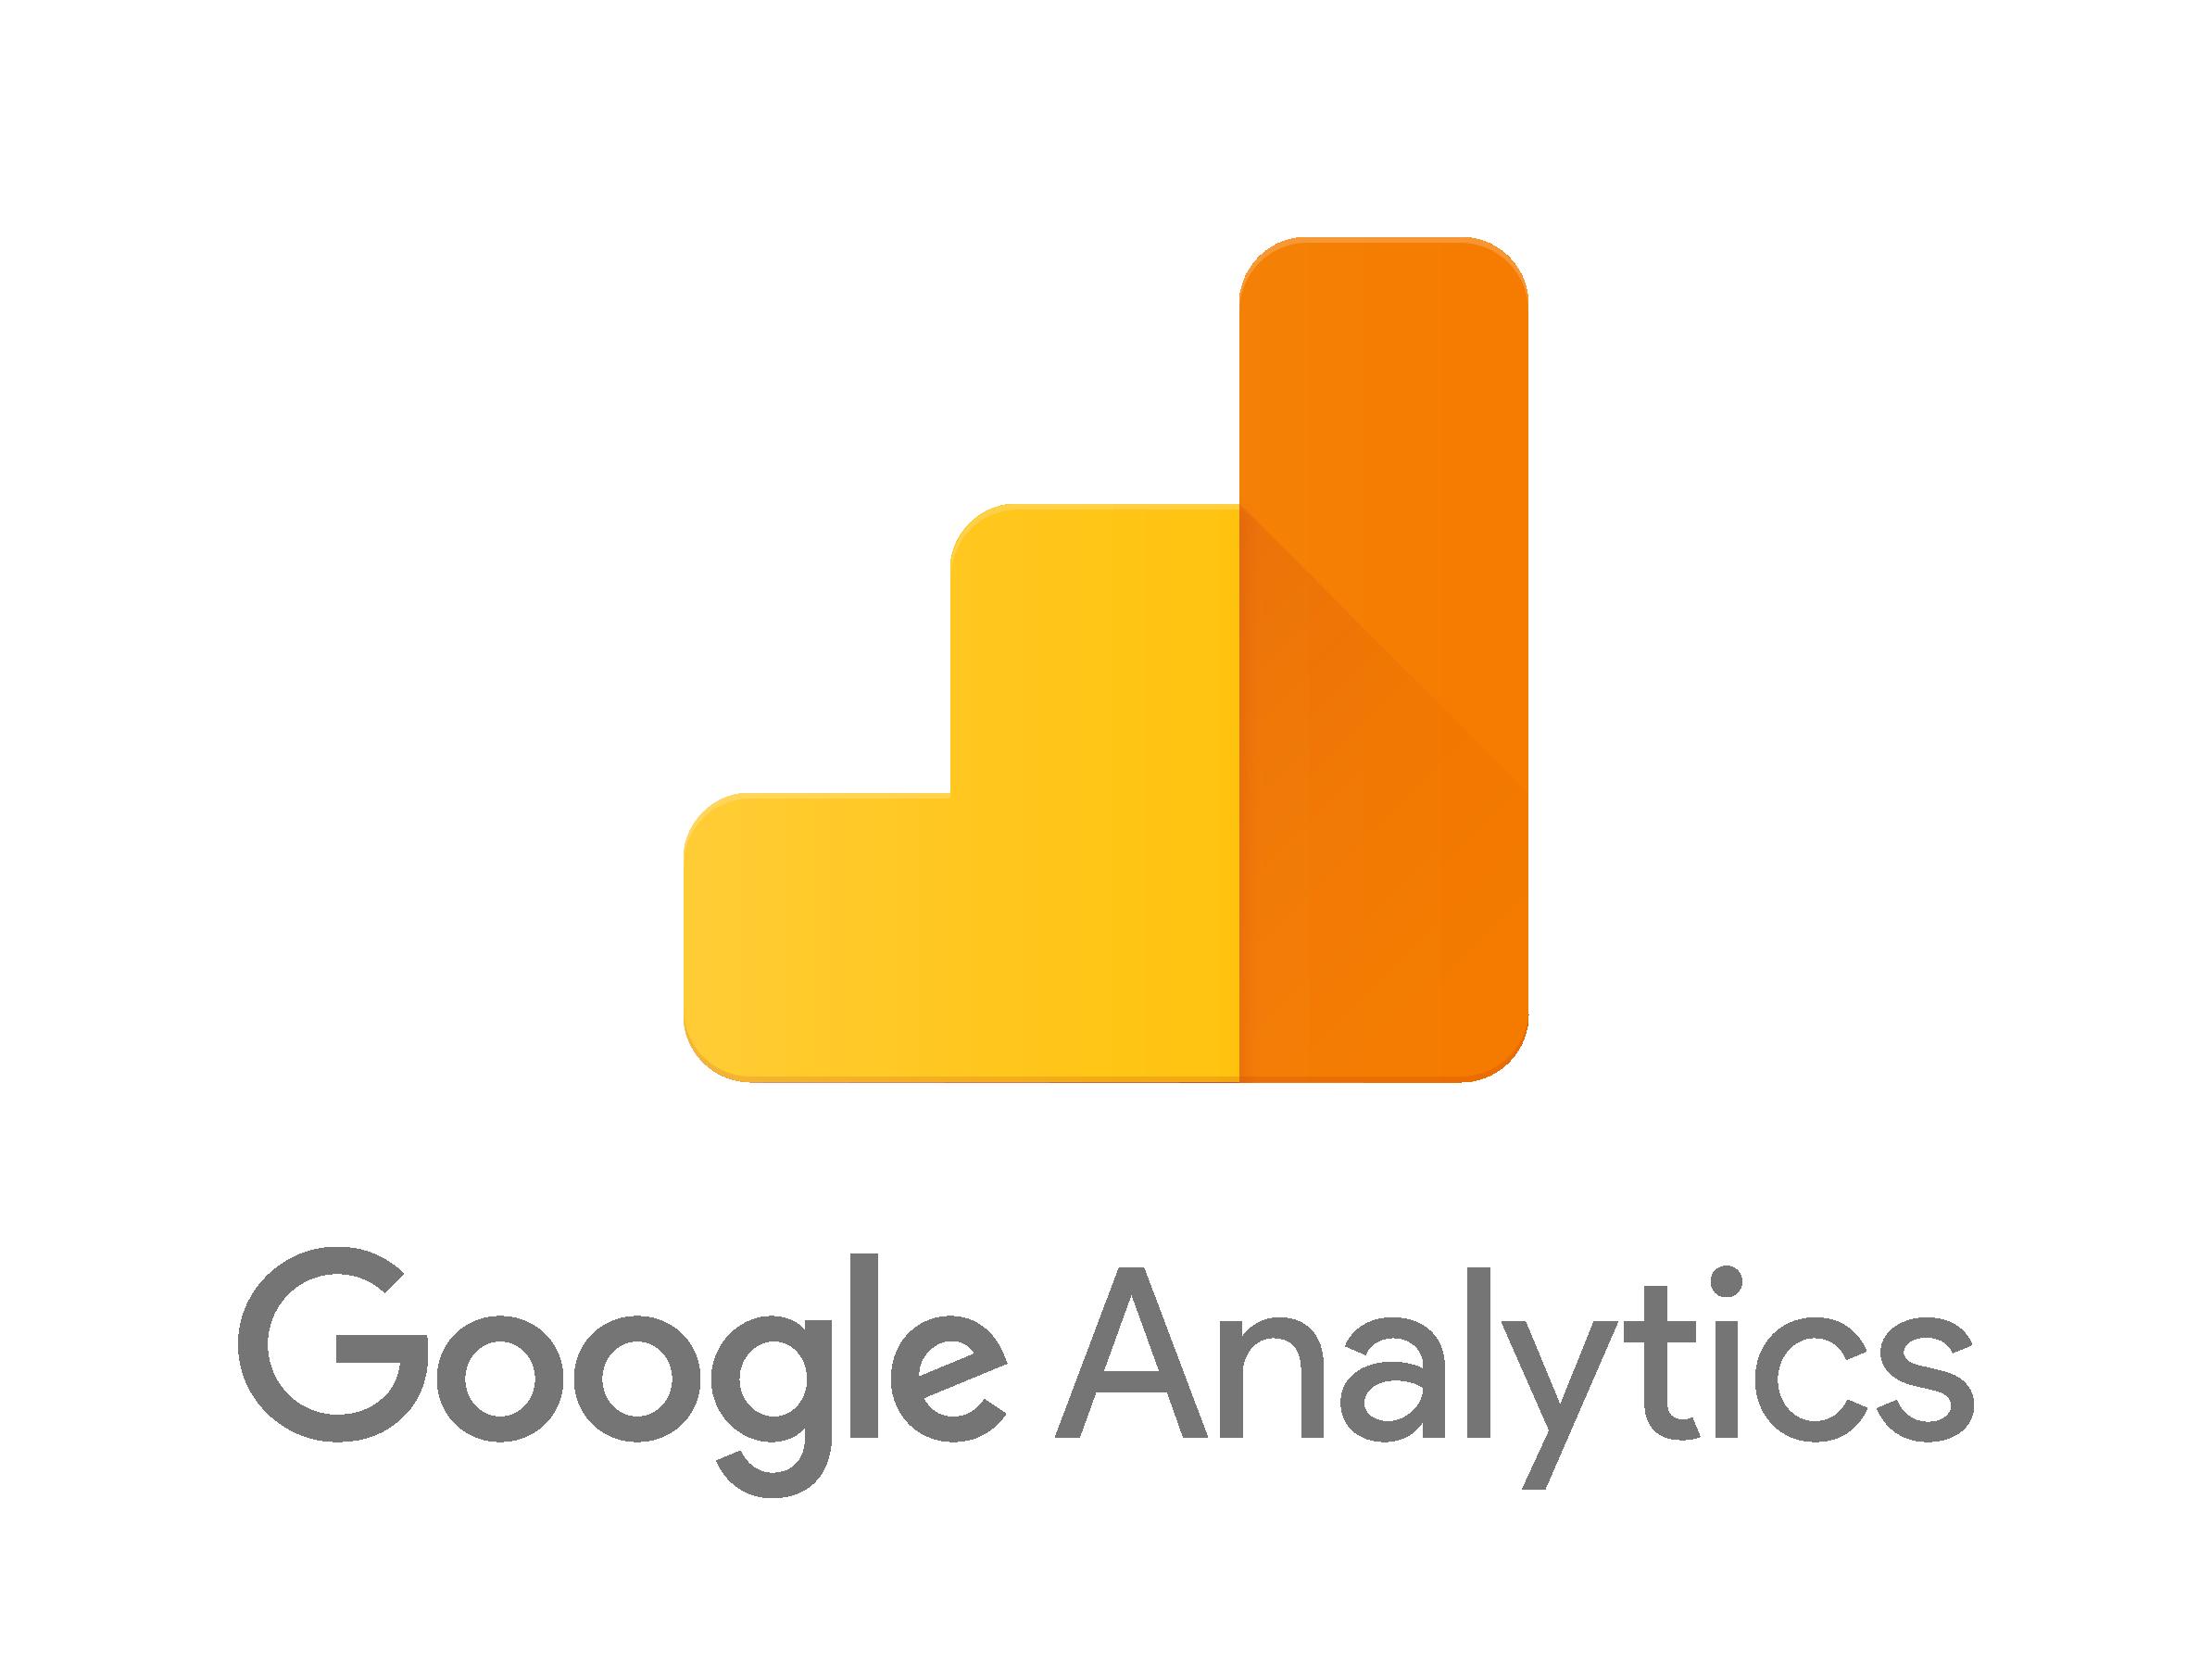 google_analytics_logo_lockup_analytics_icon_vertical_black_2x.png